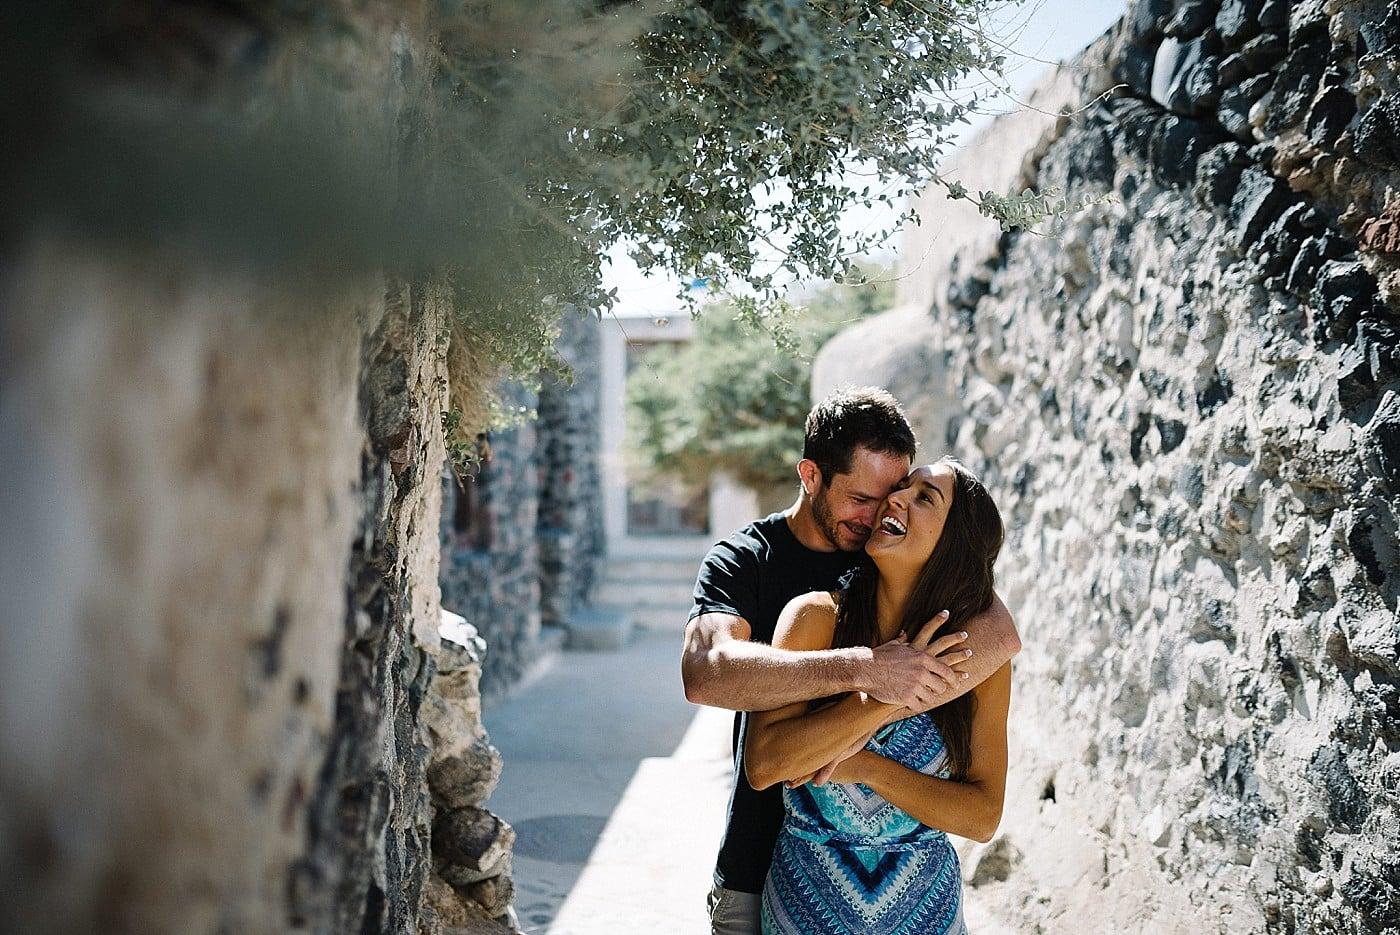 santorini-engagement-photography-elopement-wedding-photographer_0011